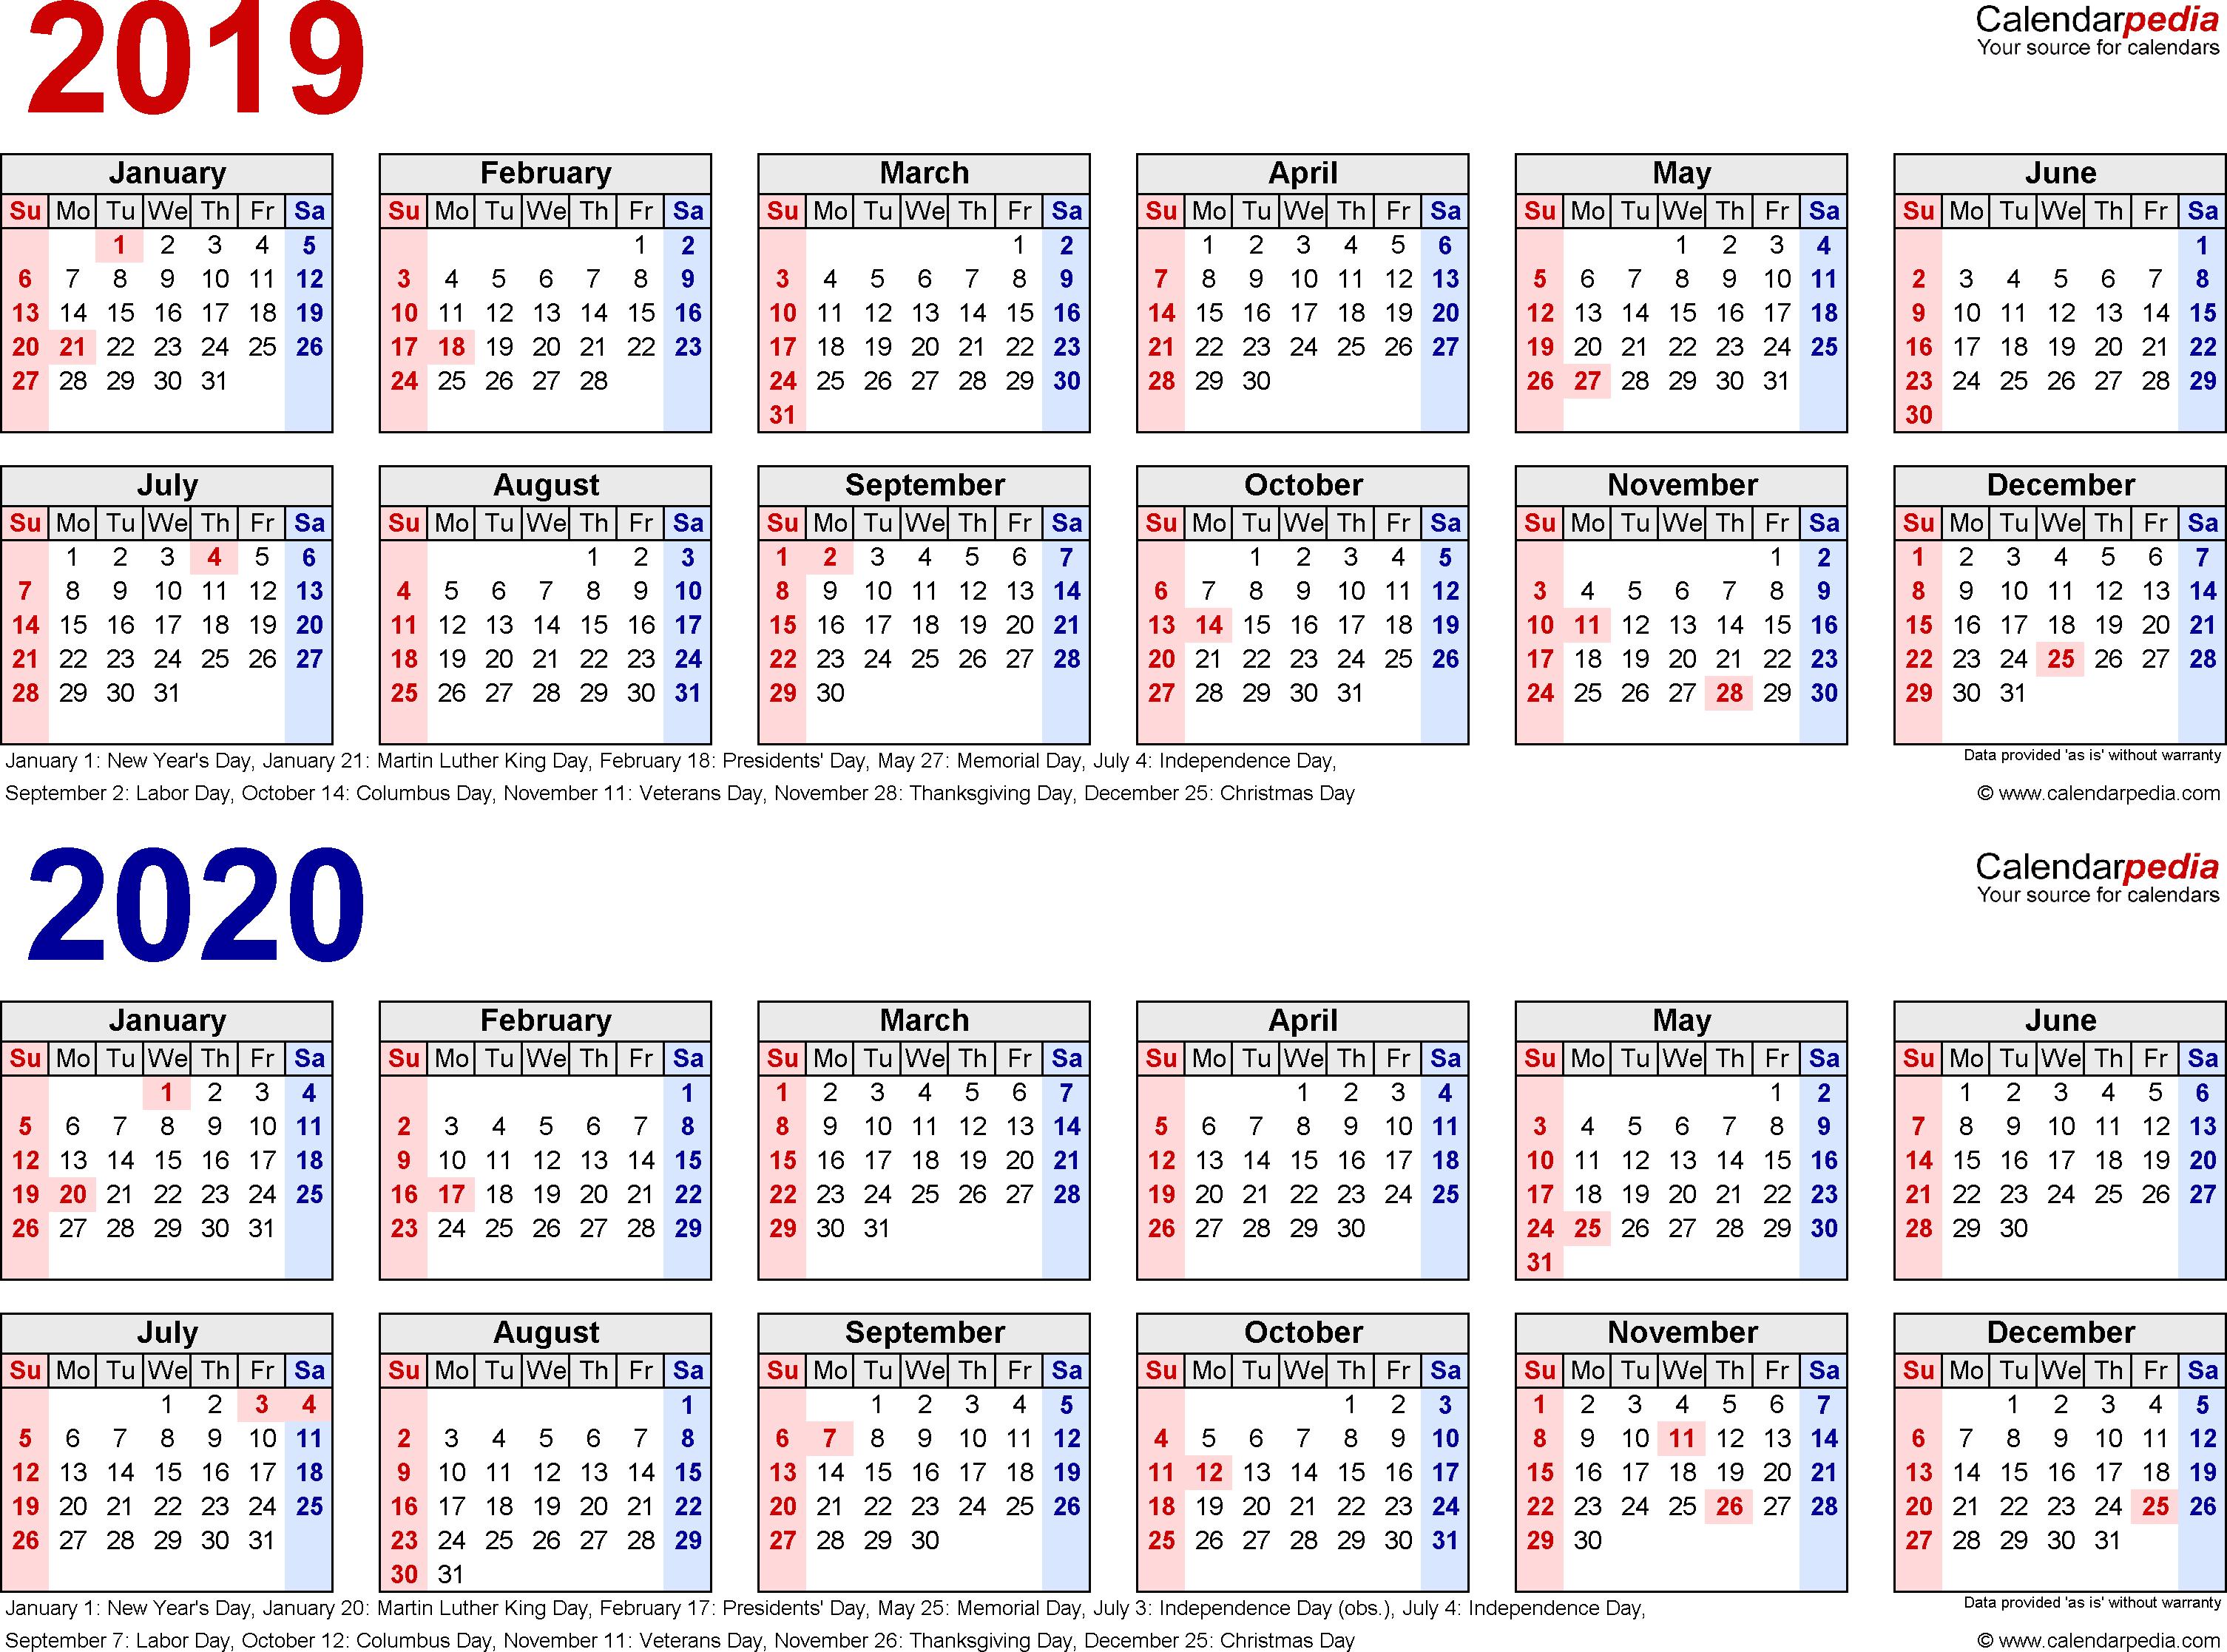 2019-2020 Calendar - Free Printable Two-Year Word Calendars within Edit Free Calendar Template 2019-2020